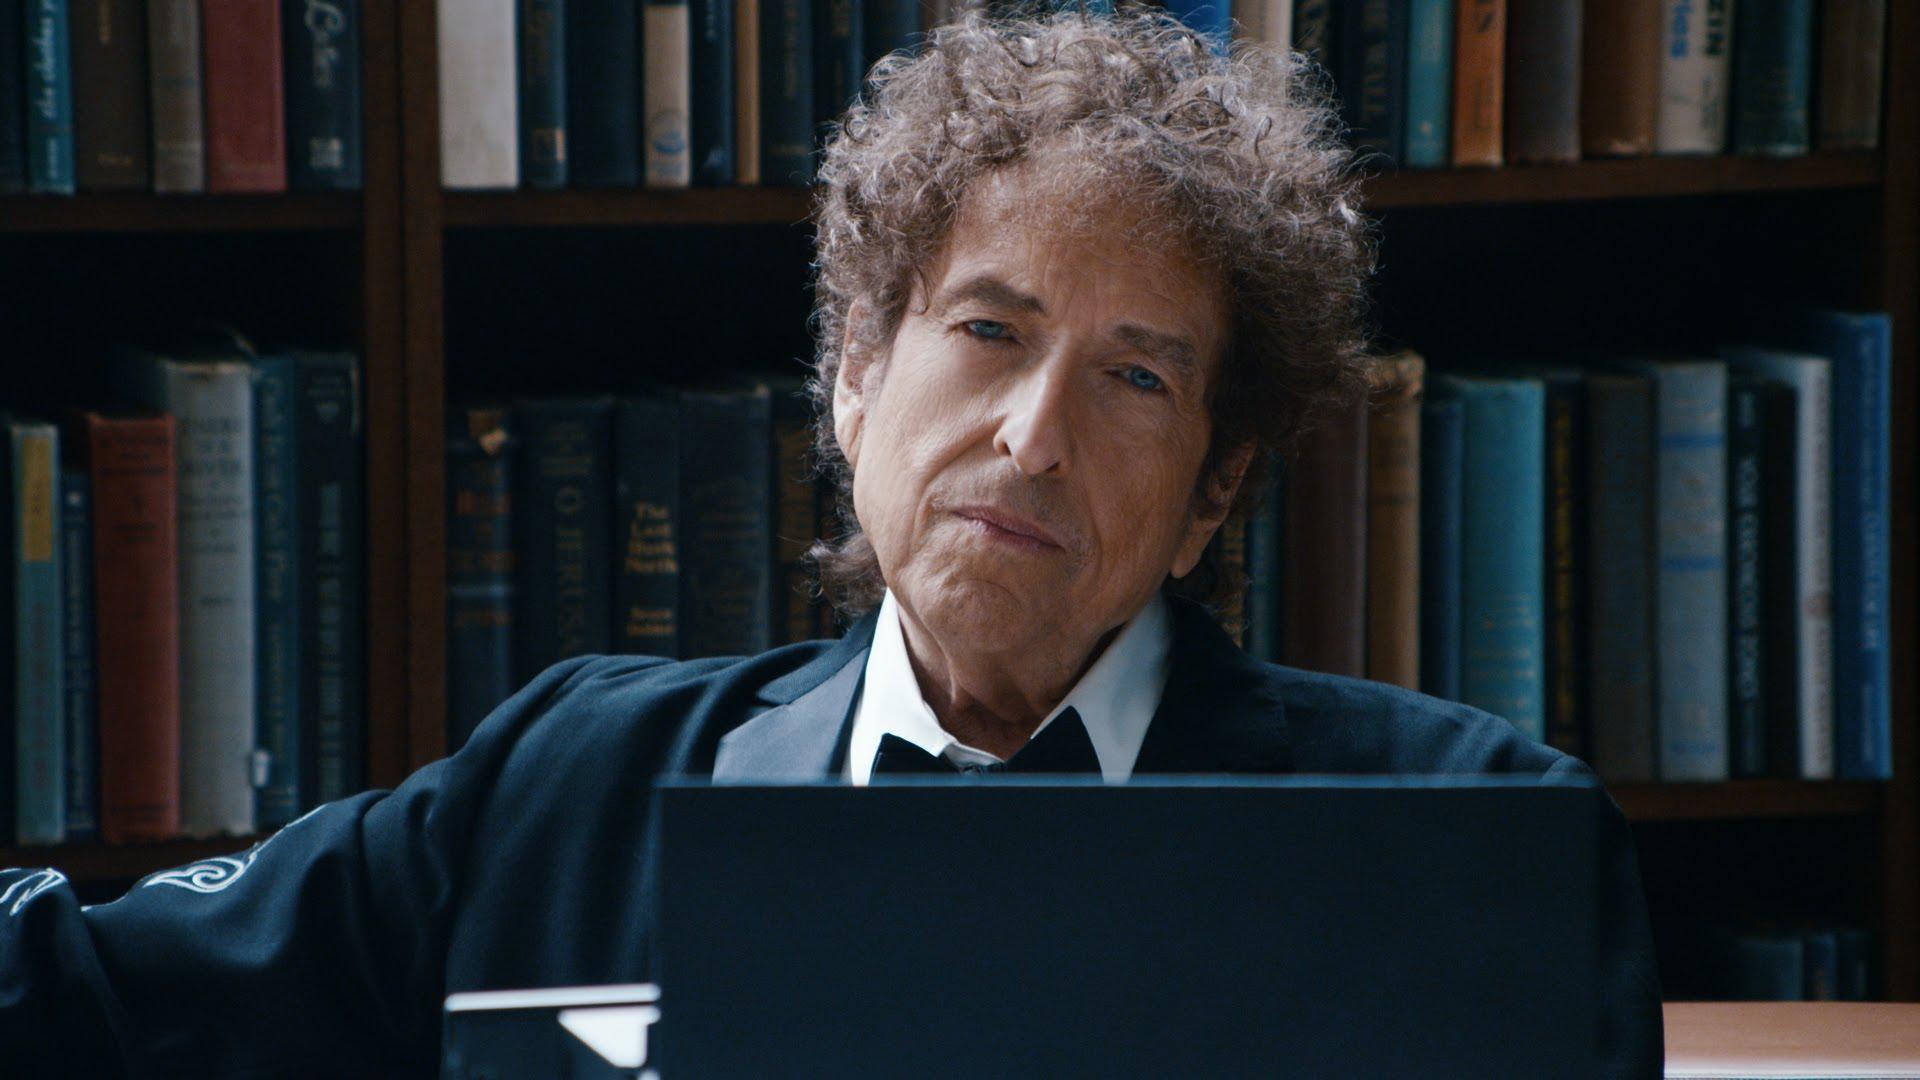 Bob Dylan Winner of the Nobel Prize in Literature 2016